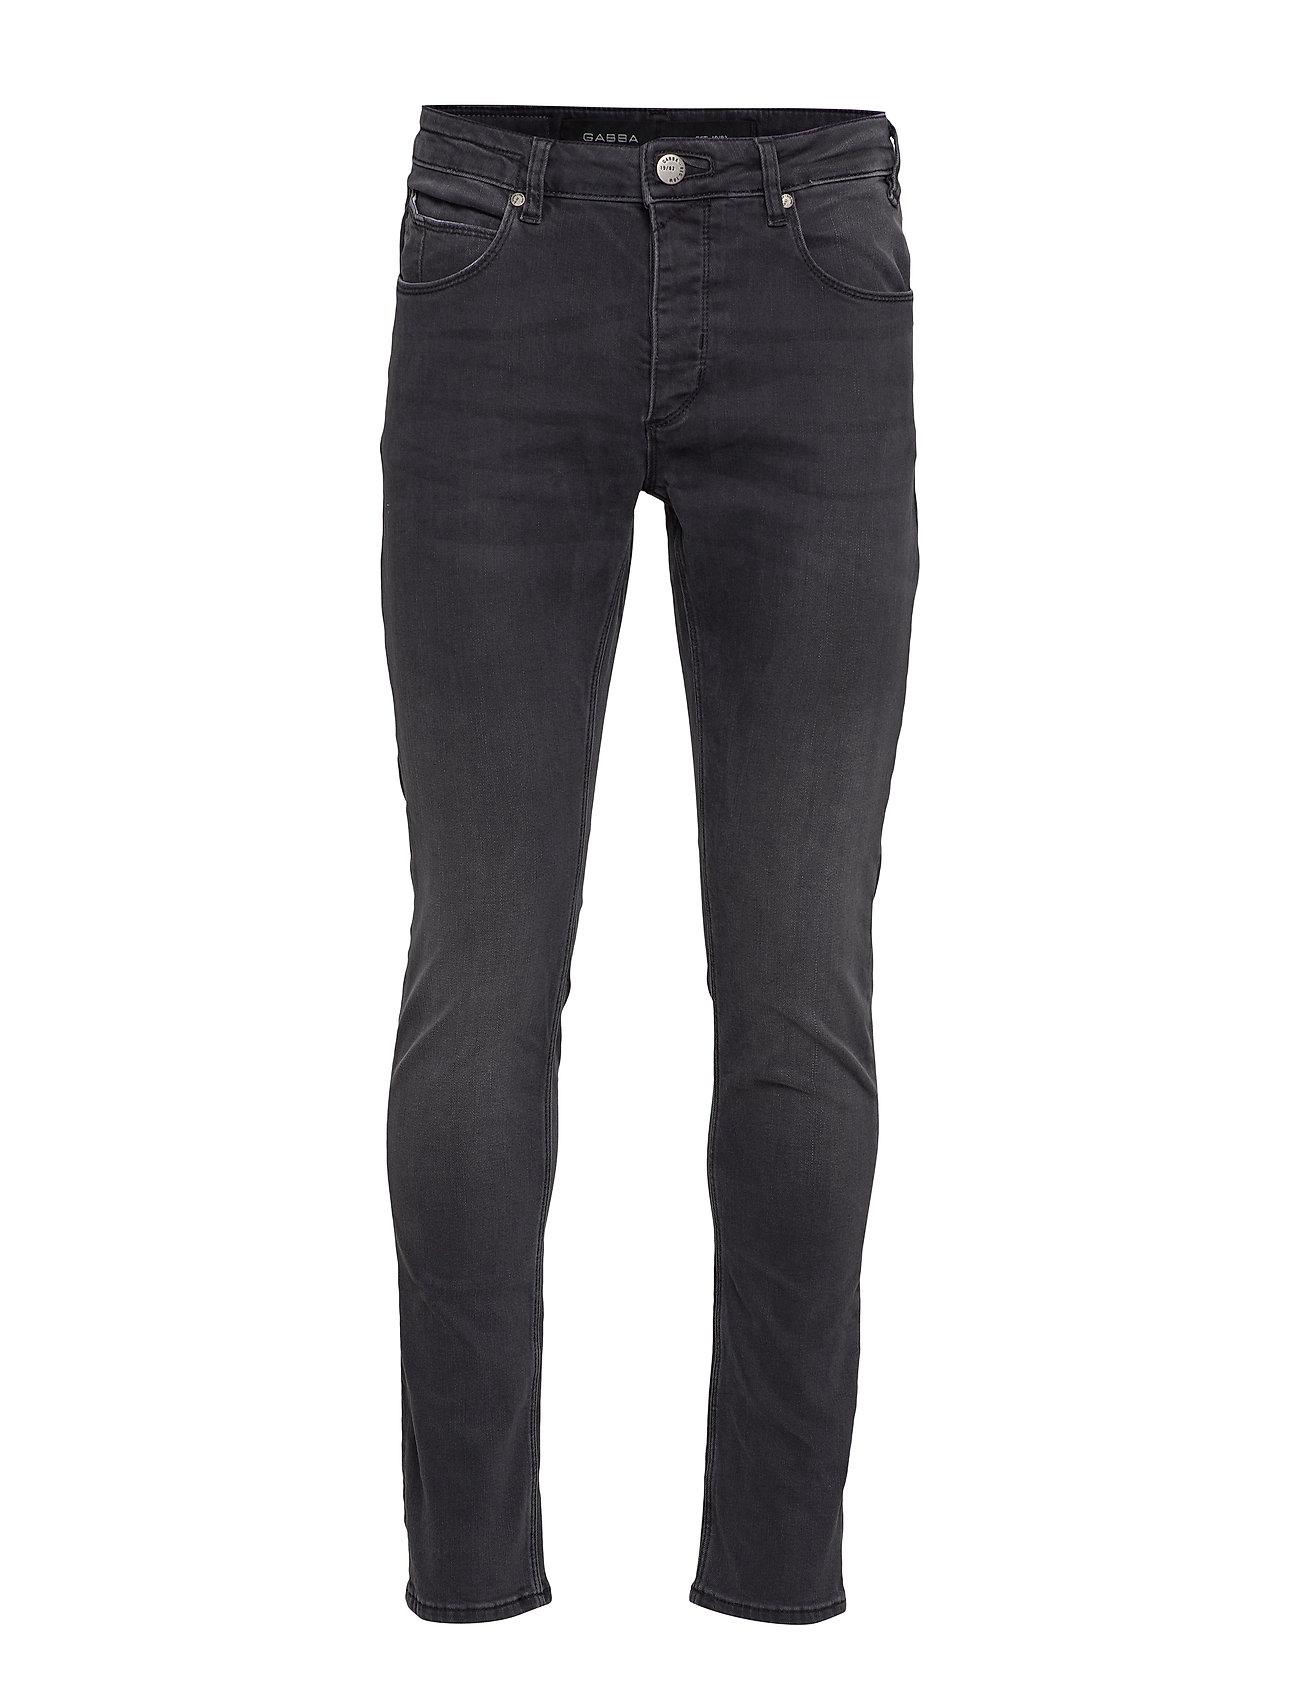 Image of Rey Thor Jeans Slim Jeans Sort Gabba (3292990539)